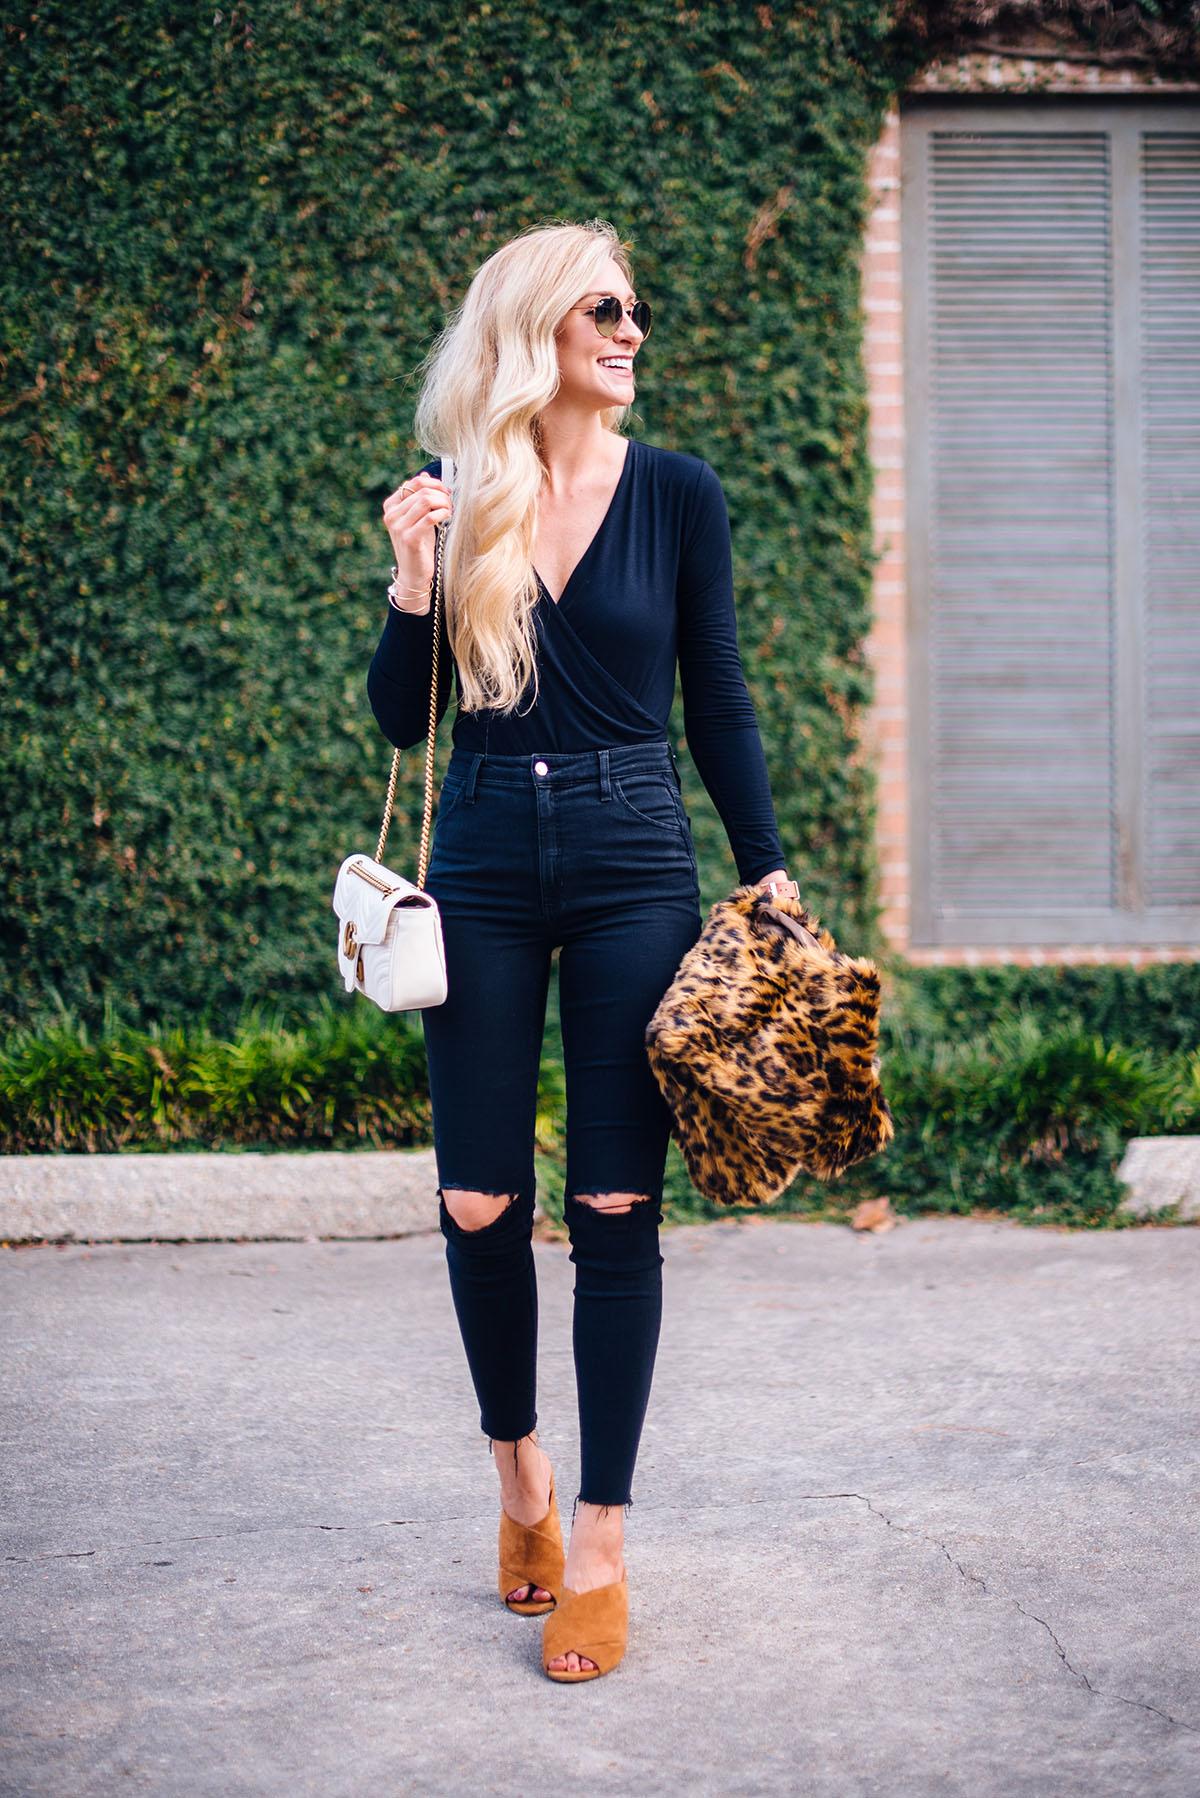 Animal Print Faux Fur Vest | Fall Outfit Ideas